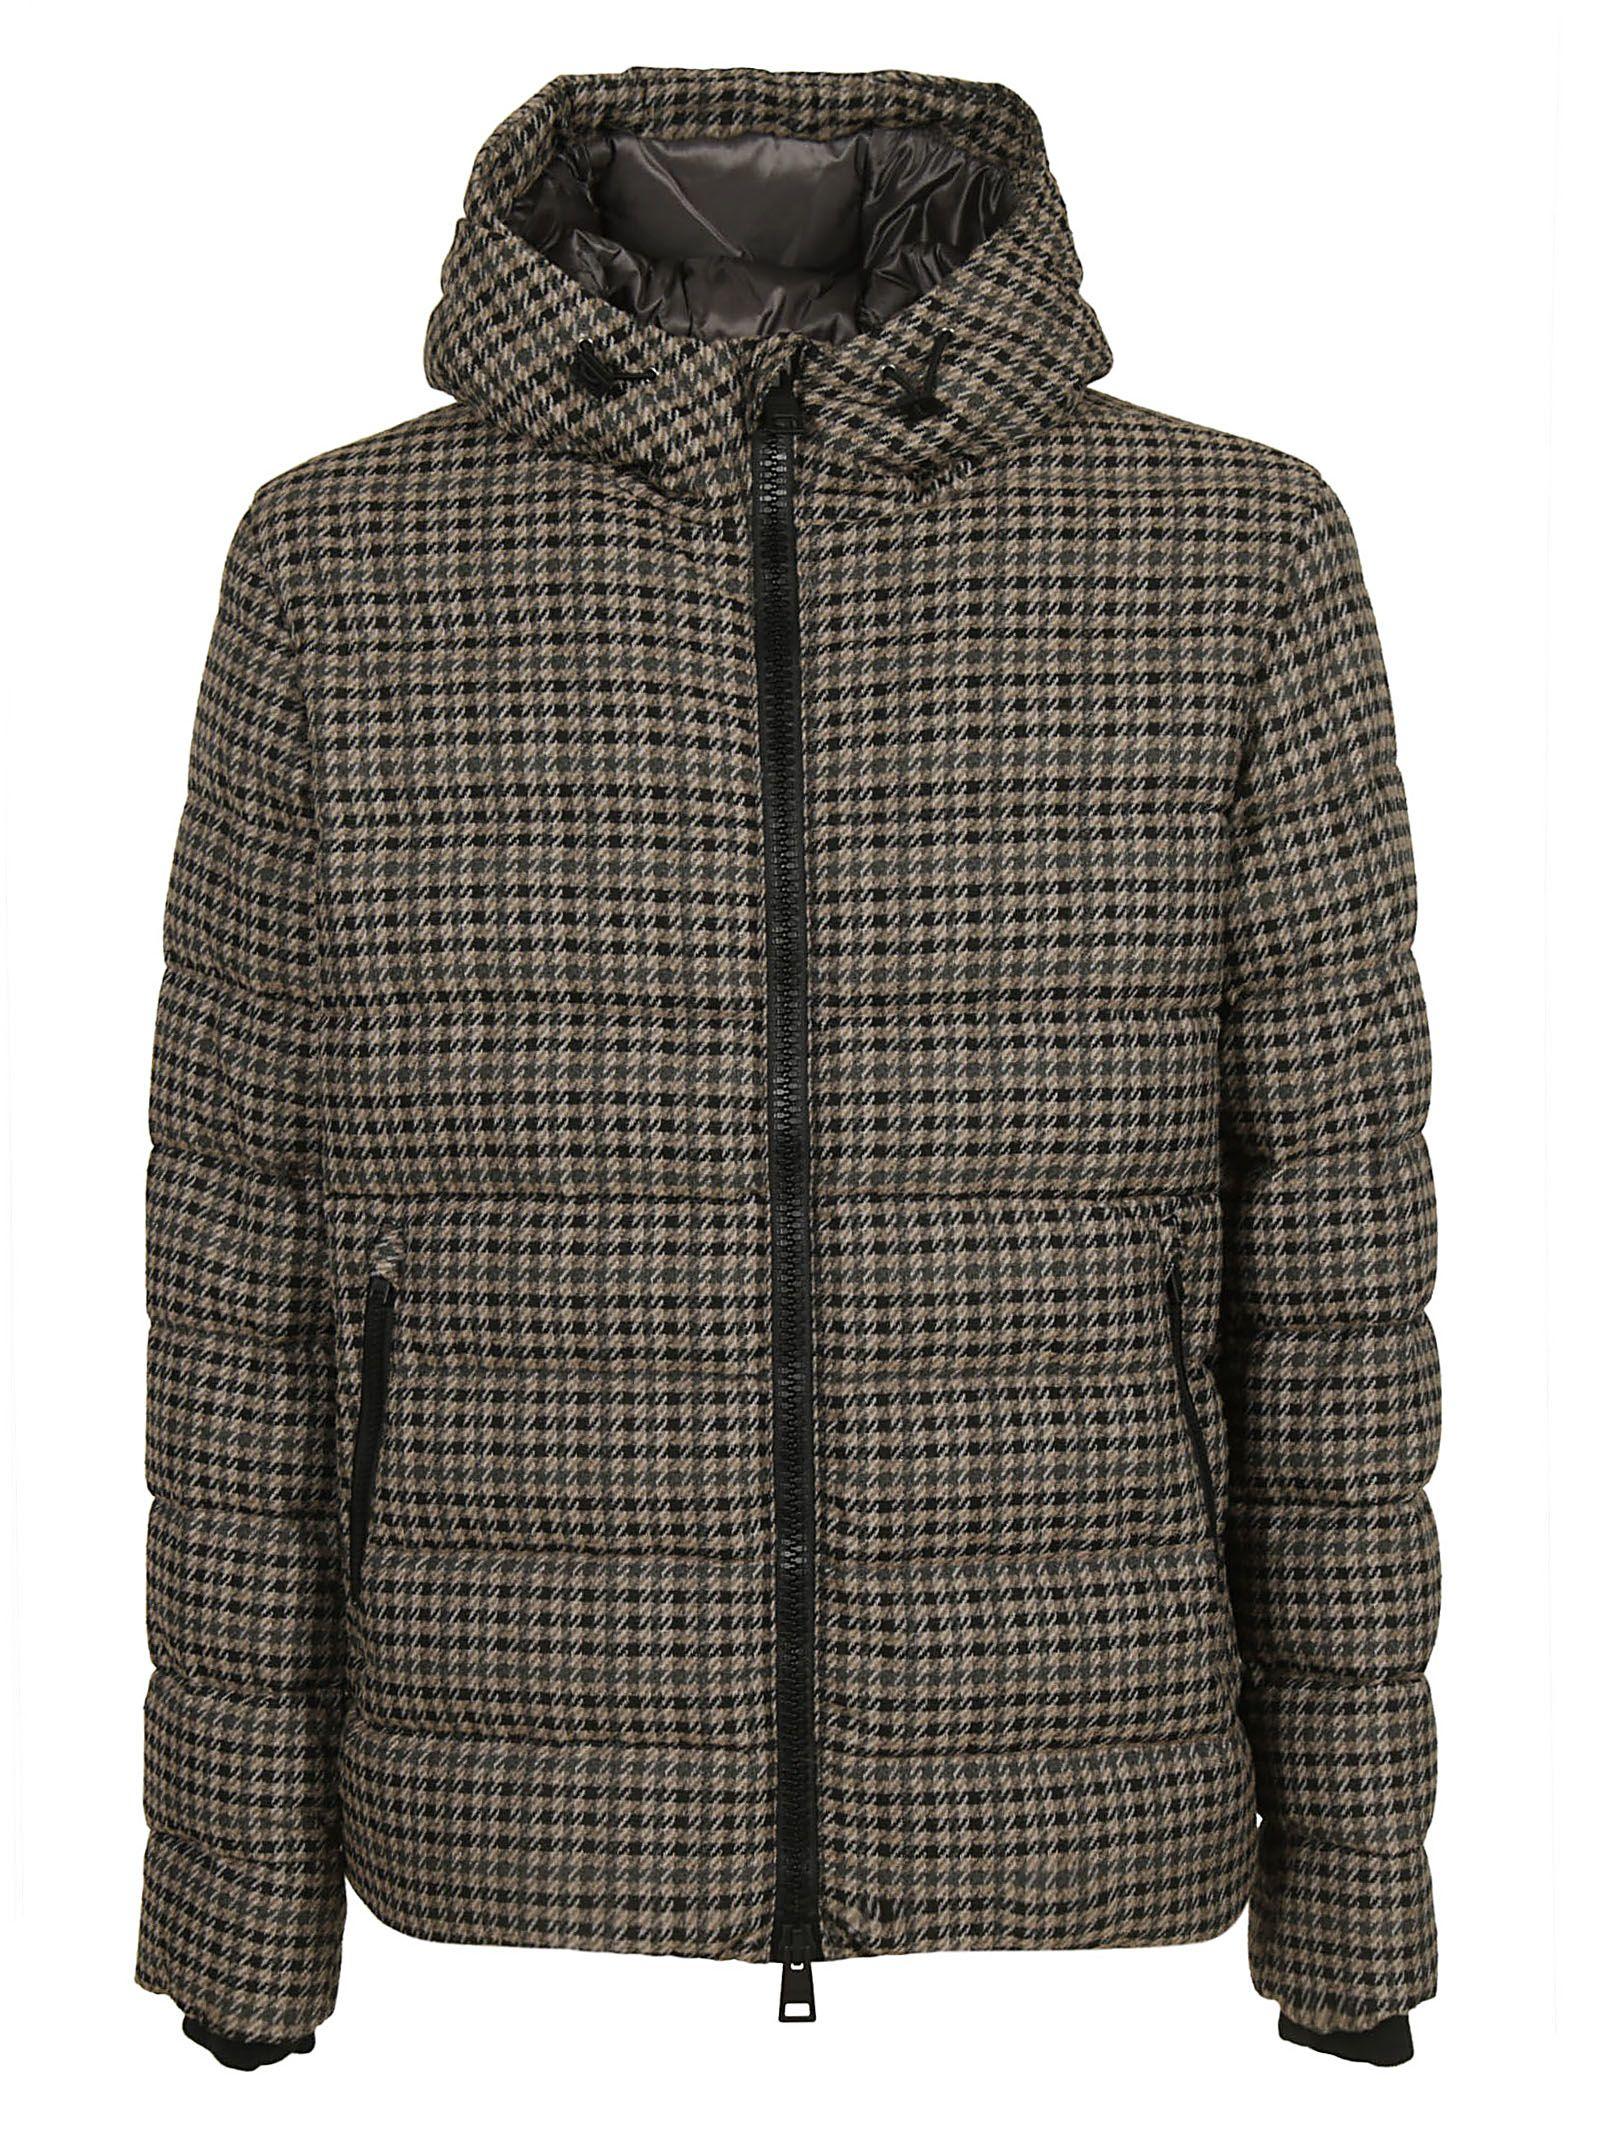 Herno Houndstooth Padded Jacket